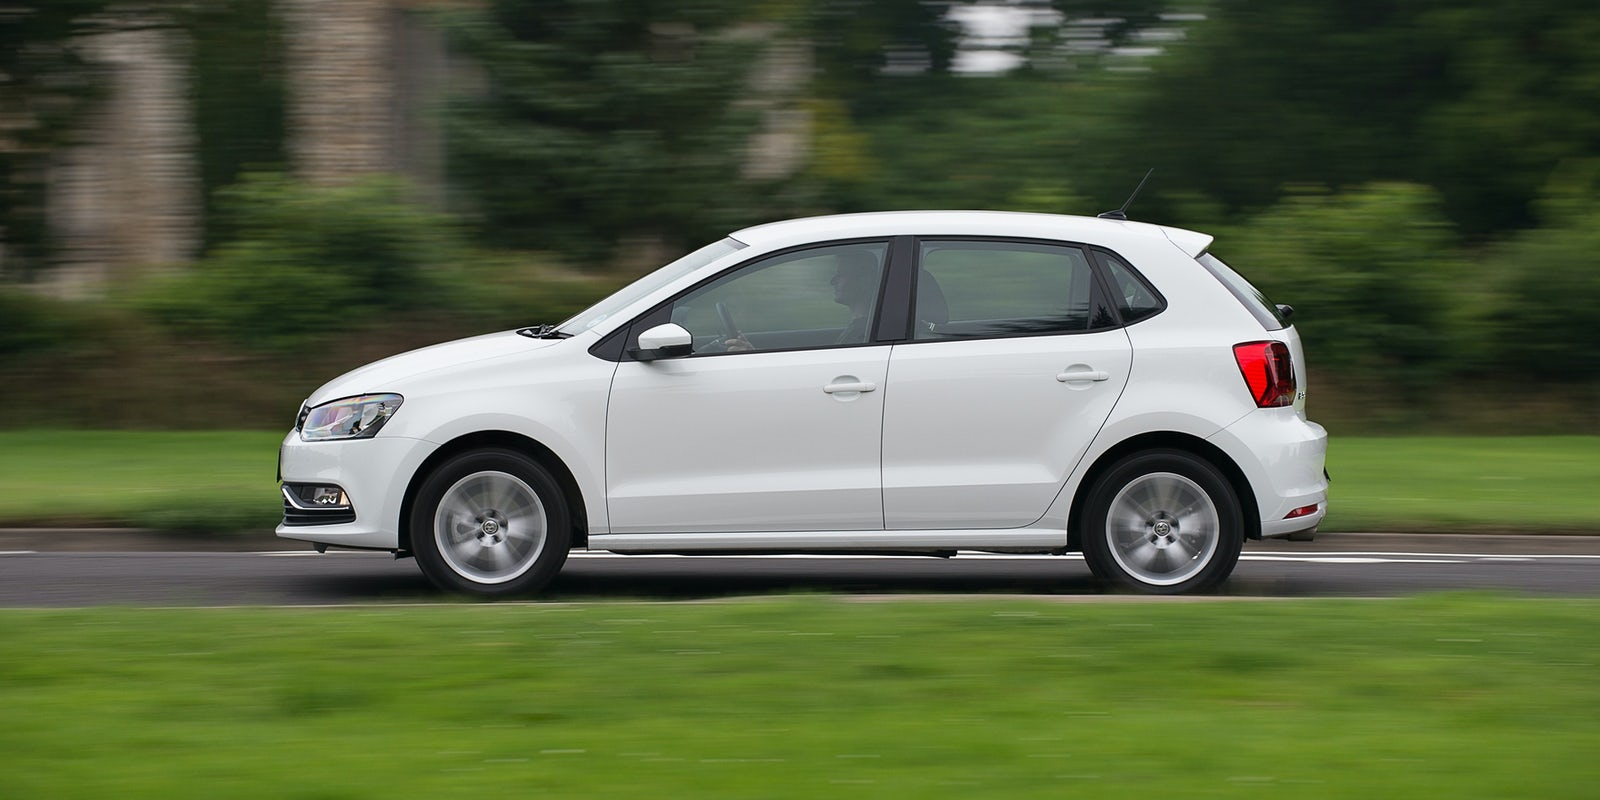 Volkswagen polo 2010 model araba resimleri - Five Door Models Make Fitting A Child Seat Easier